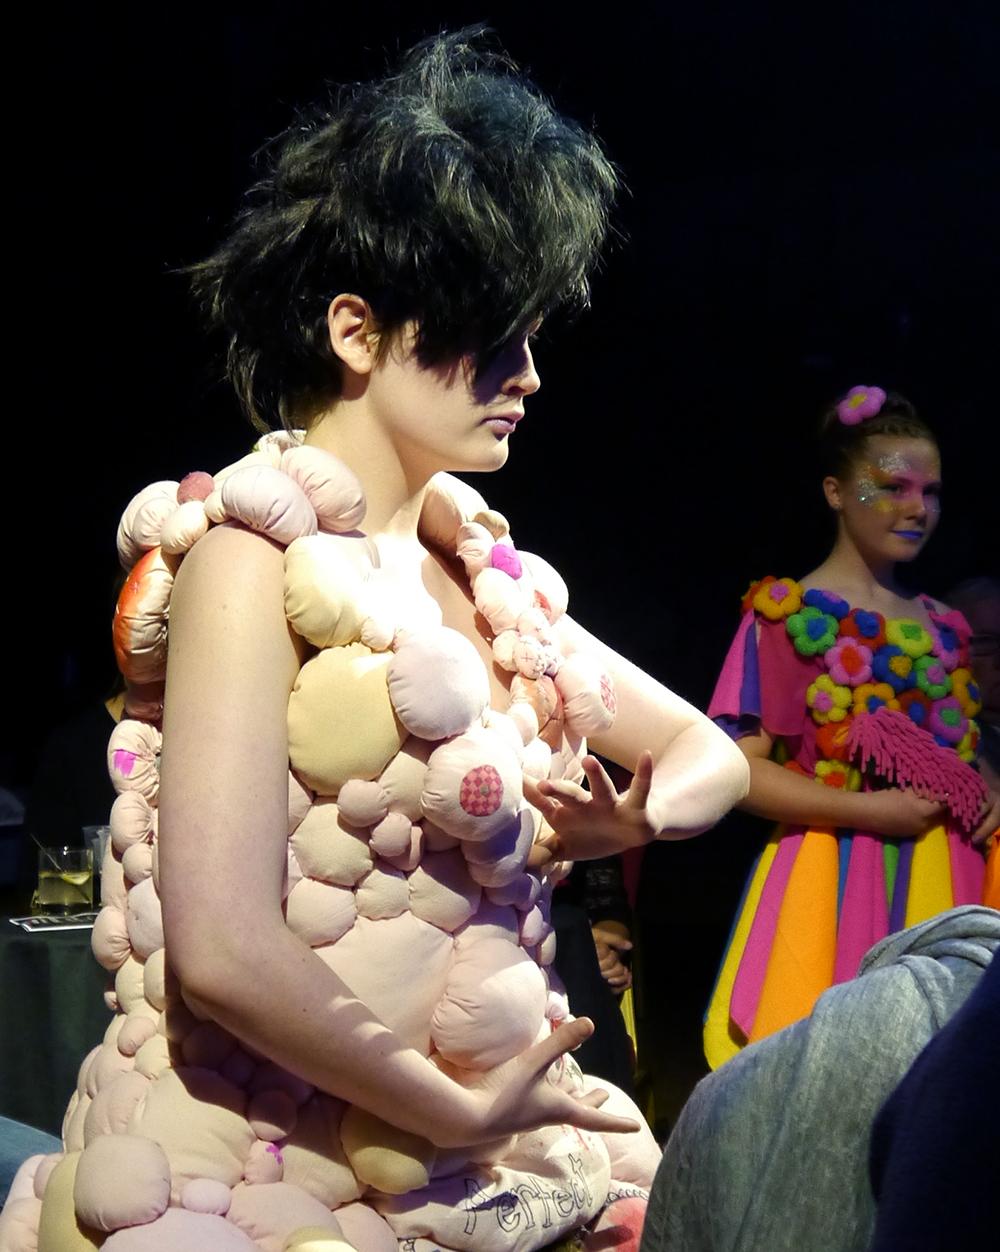 Dundee Wearable Art, Dundee Wearable Art Show, Wearable art, performance, fashion and art, Scottish Bloggers, Jill Skulina - Perfect Mother, Jude Barns - She Scrubs Up Well